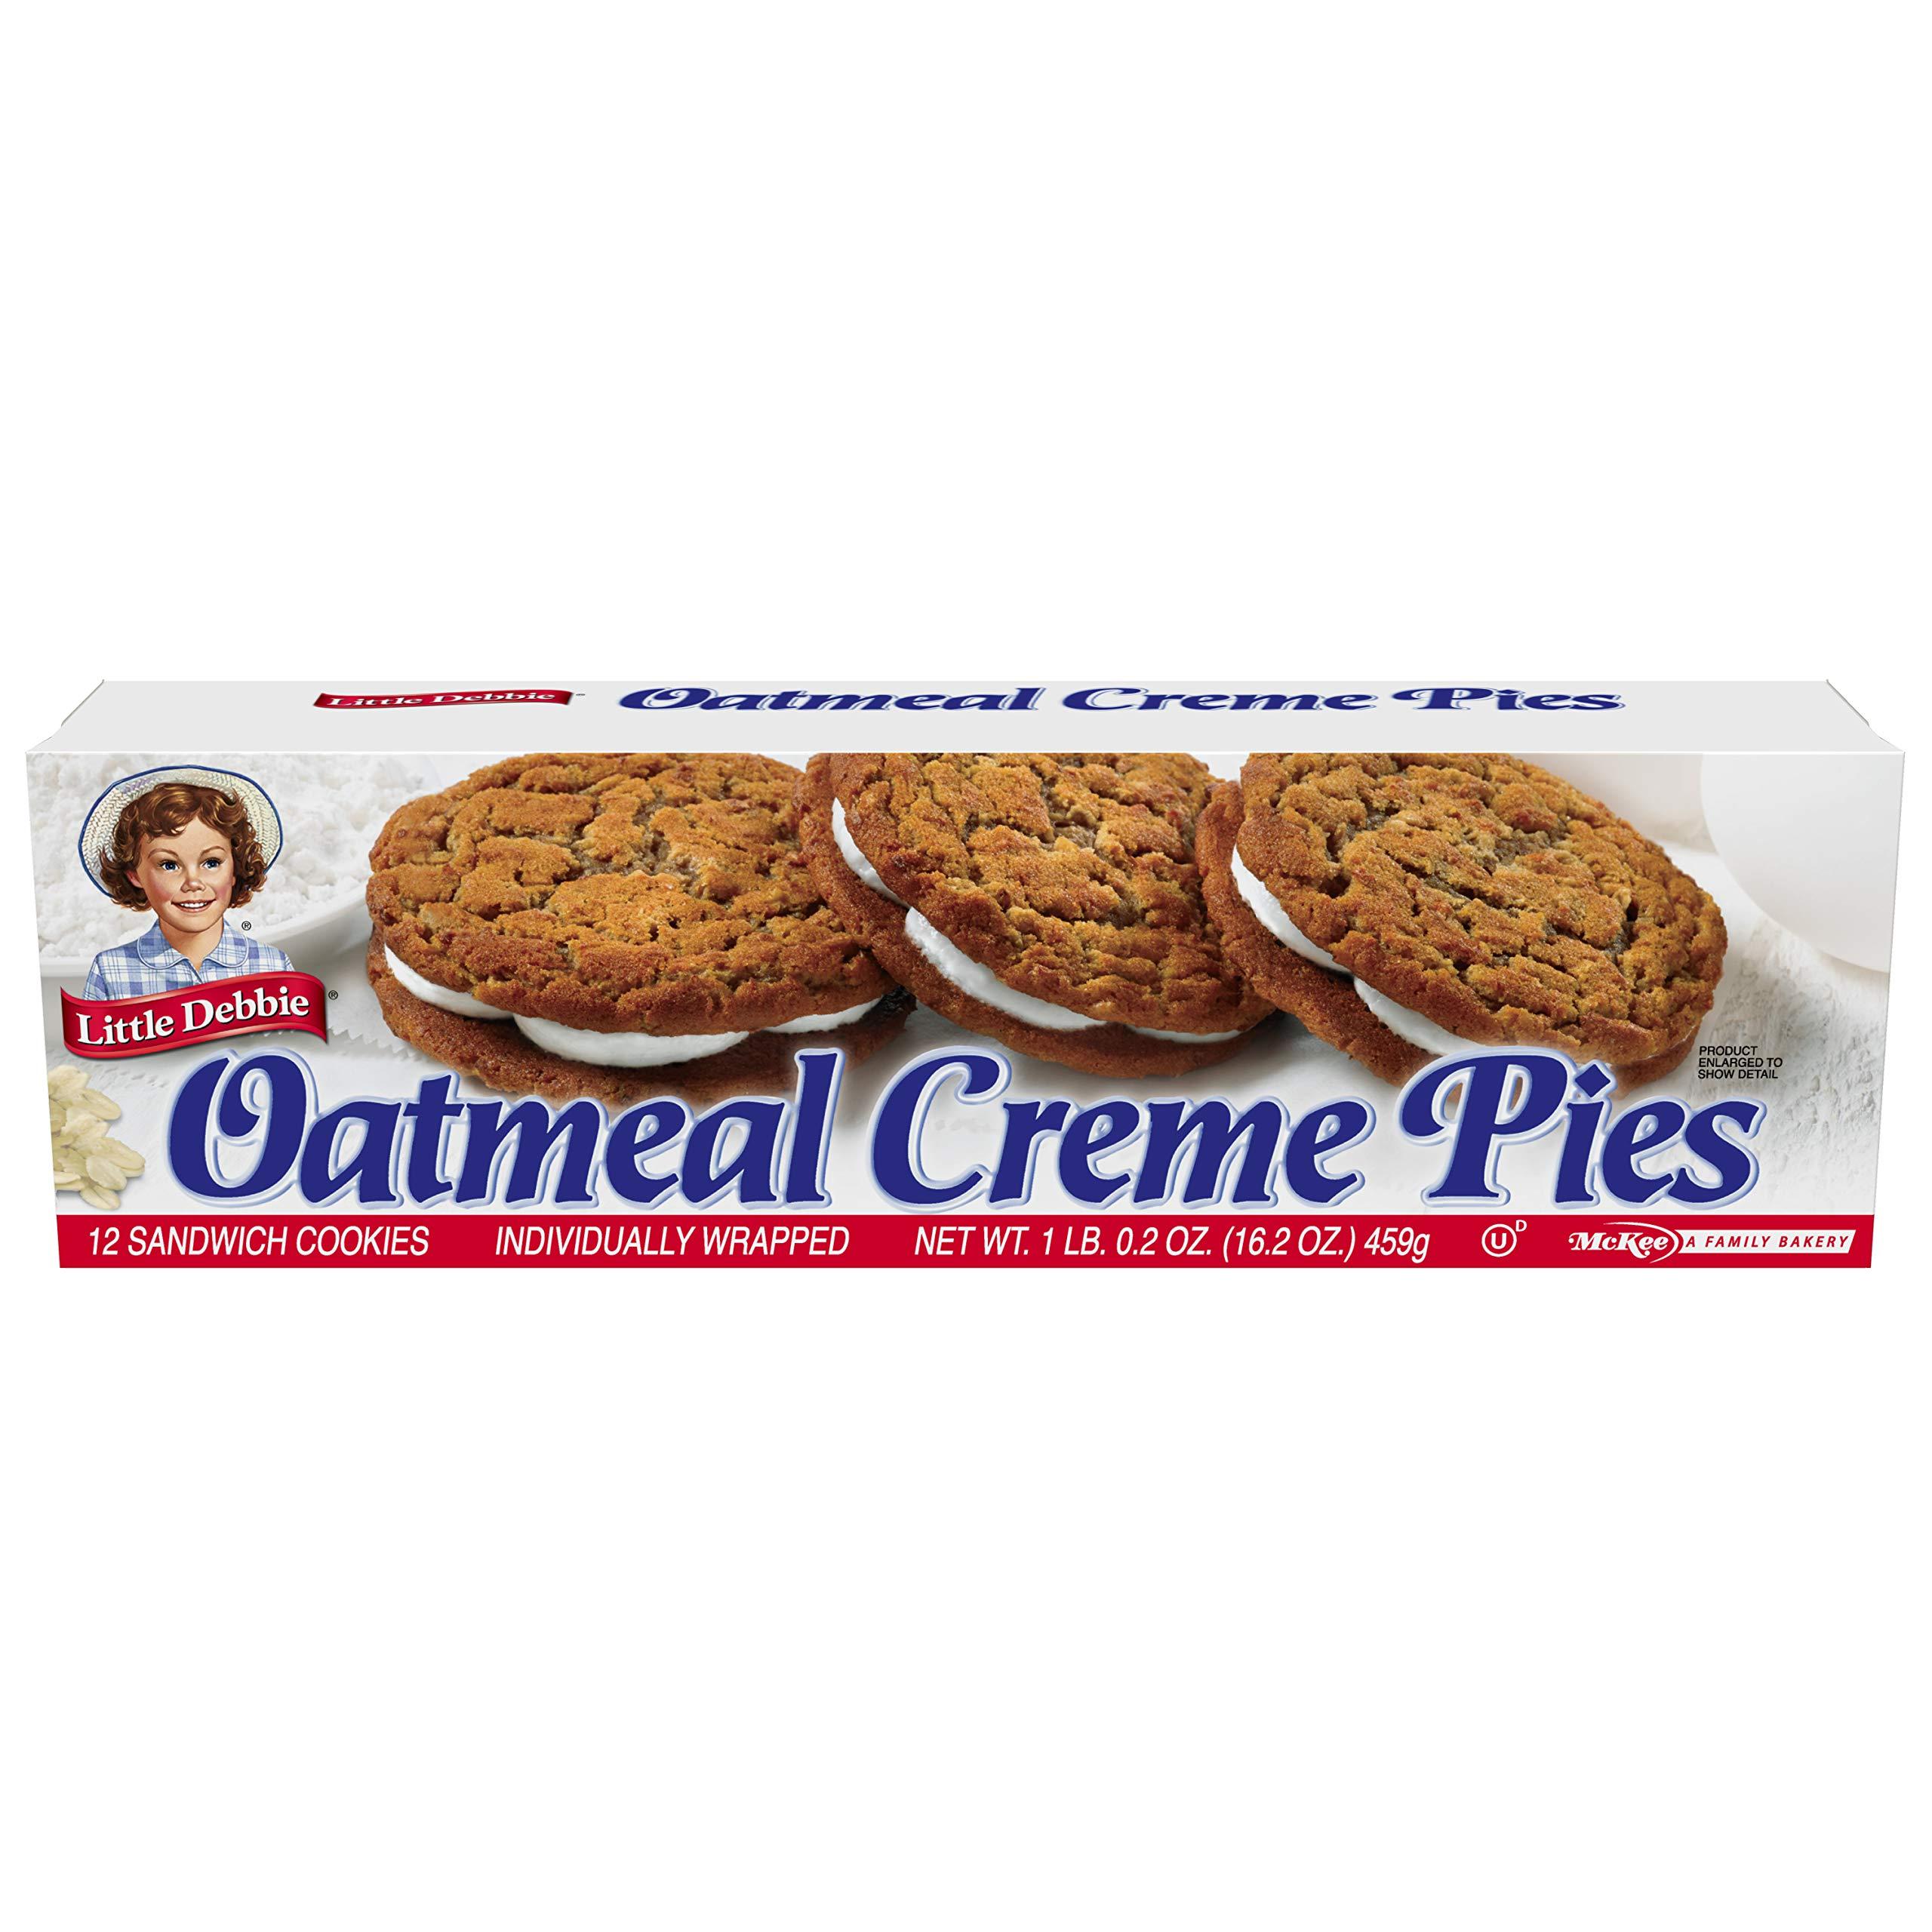 Little Debbie Variety Bundle - Oatmeal Creme Pies, Honey Buns, Swiss Rolls, Cosmic Brownies, and Zebra Cakes by Little Debbie